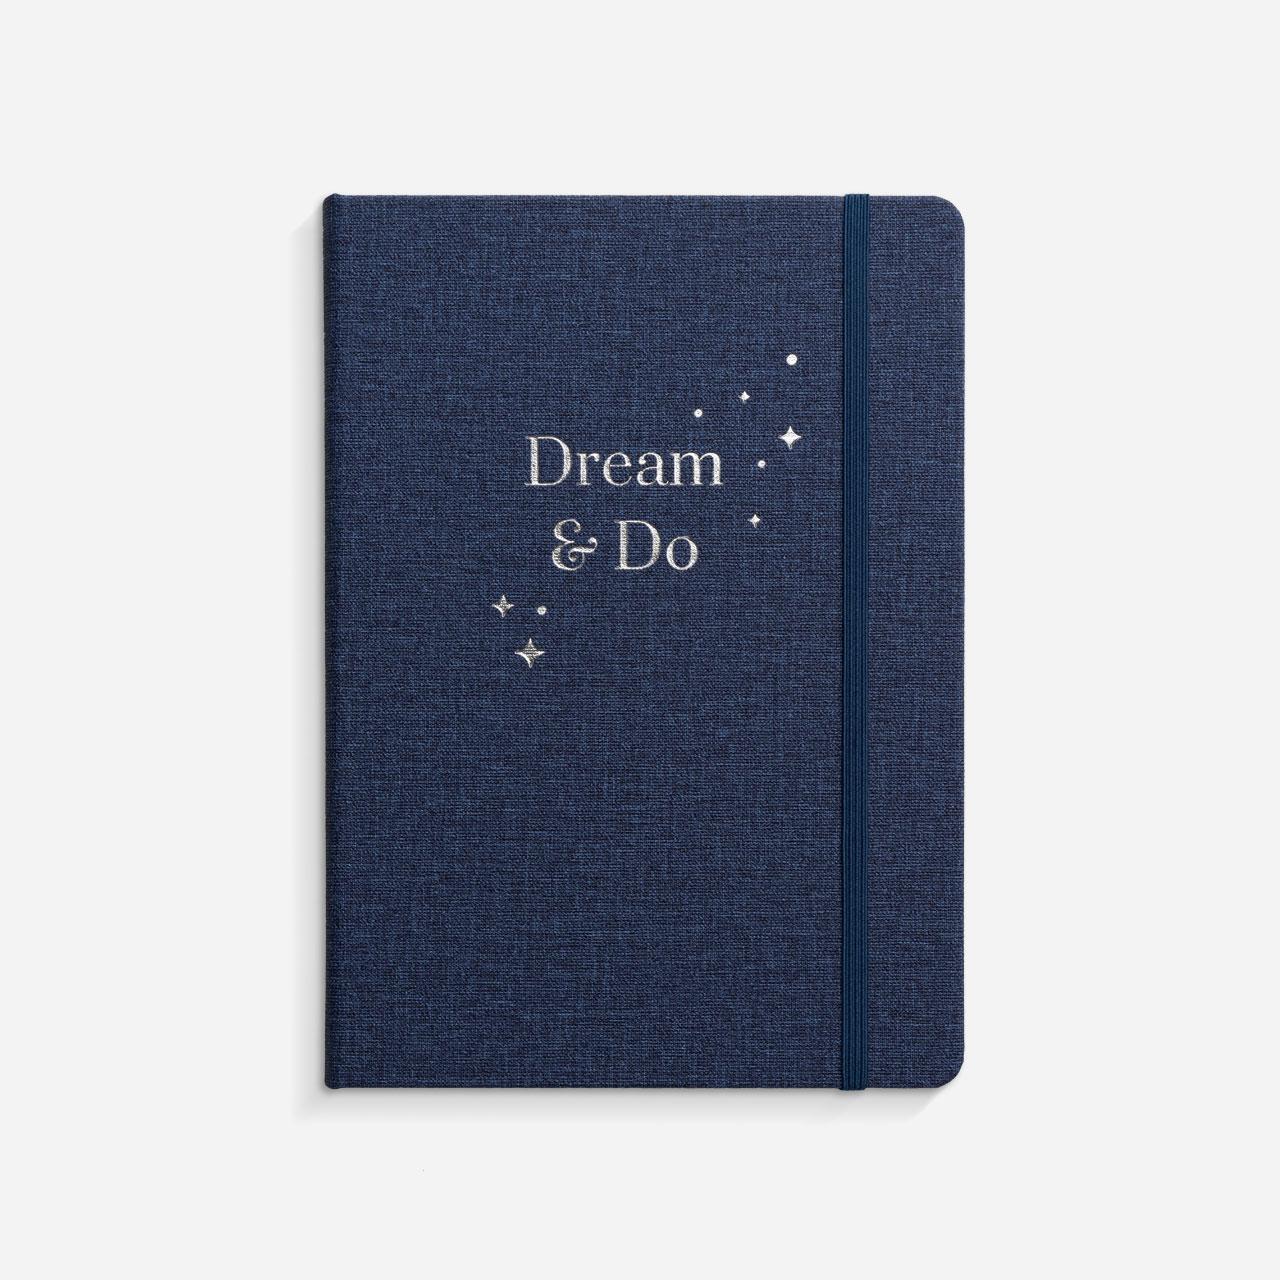 dromdagbok-dream-and-do-pinkypine